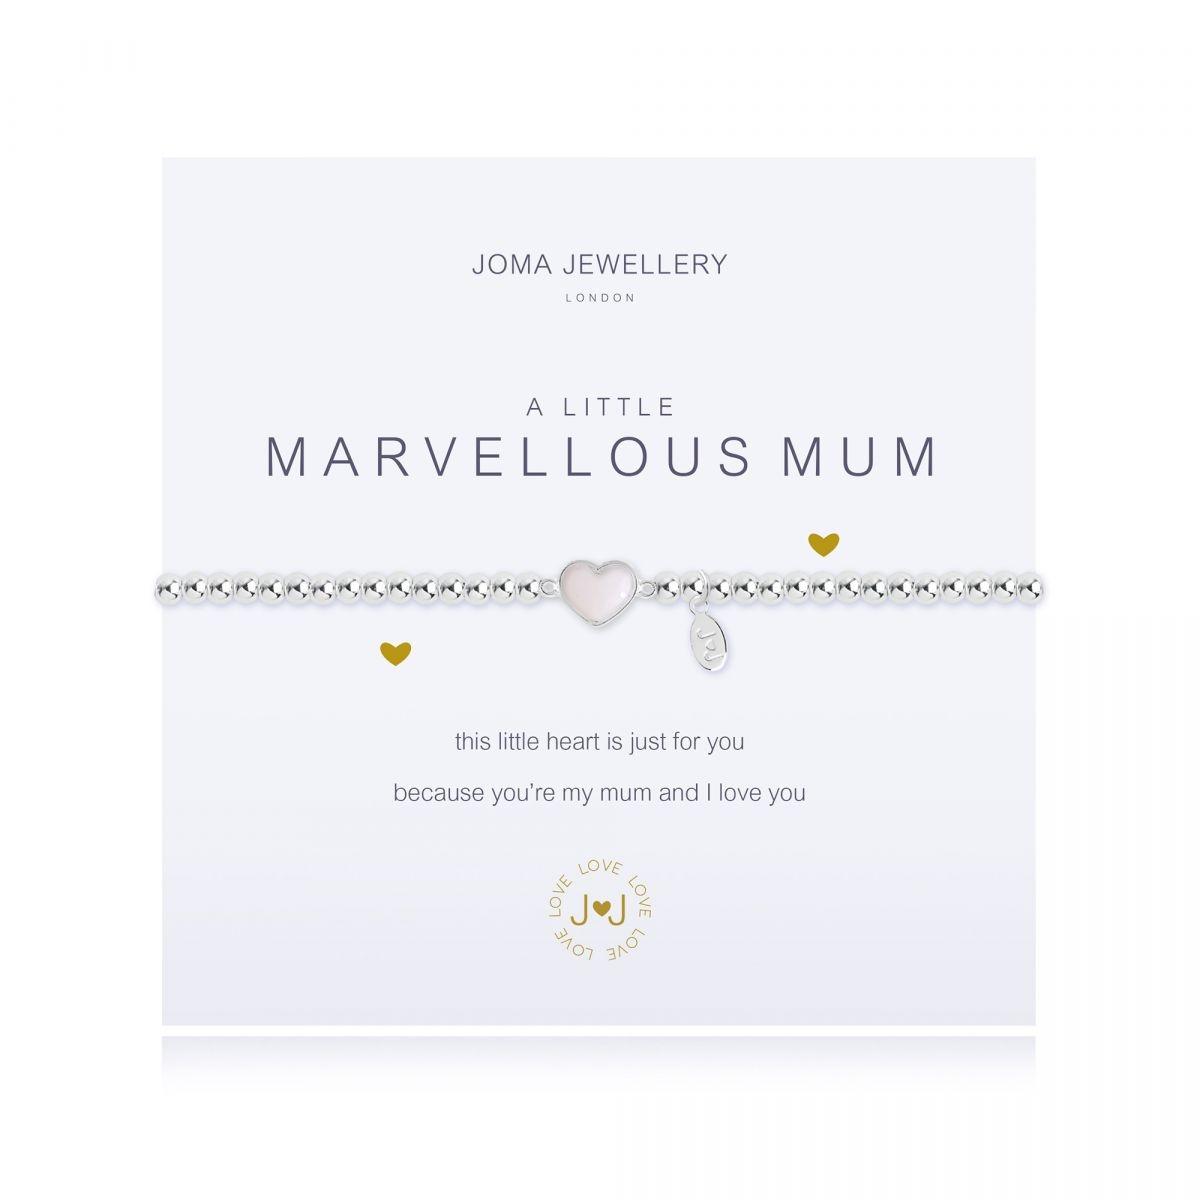 Joma Jewellery A Little 'Marvellous Mum' Bracelet